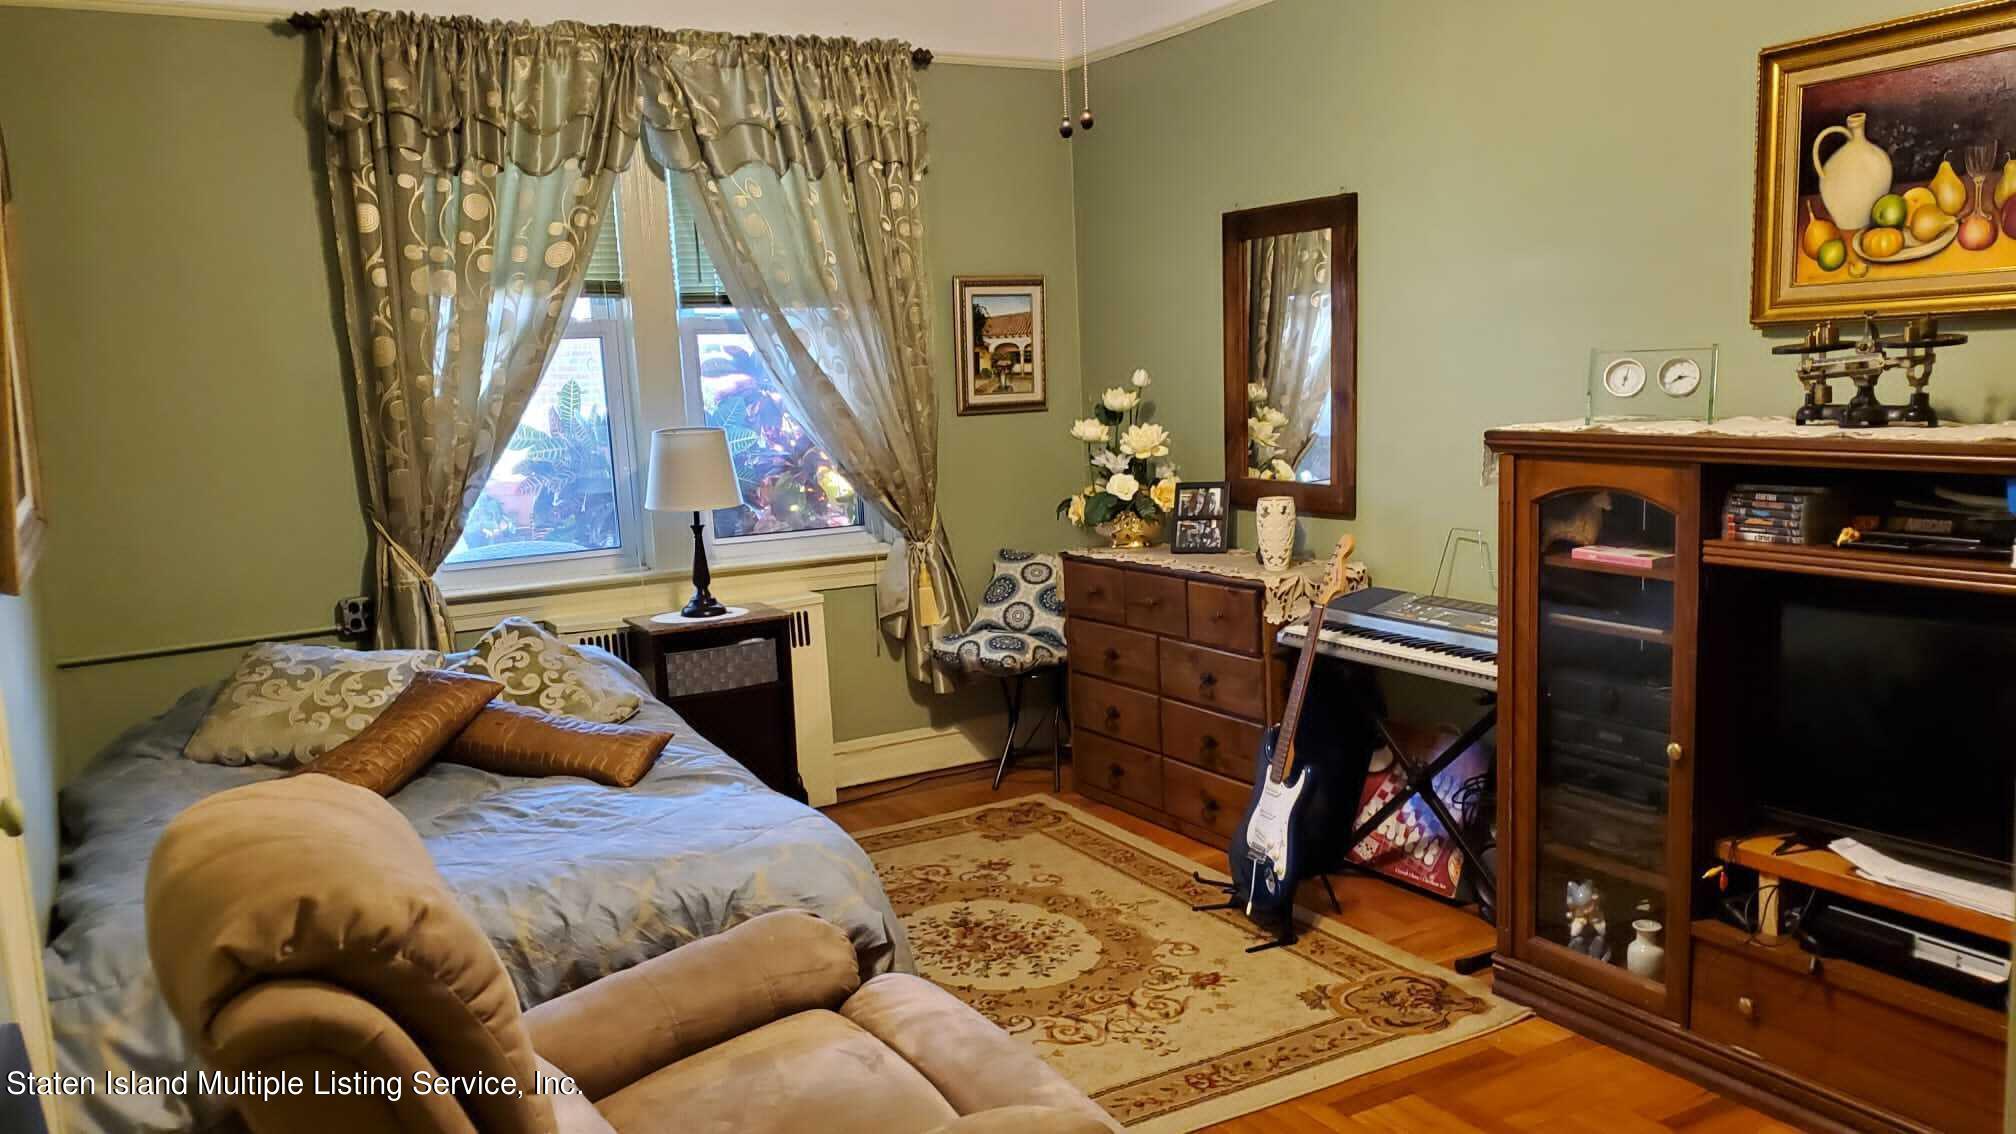 Single Family - Semi-Attached 1824 Avenue W   Brooklyn, NY 11229, MLS-1149892-12